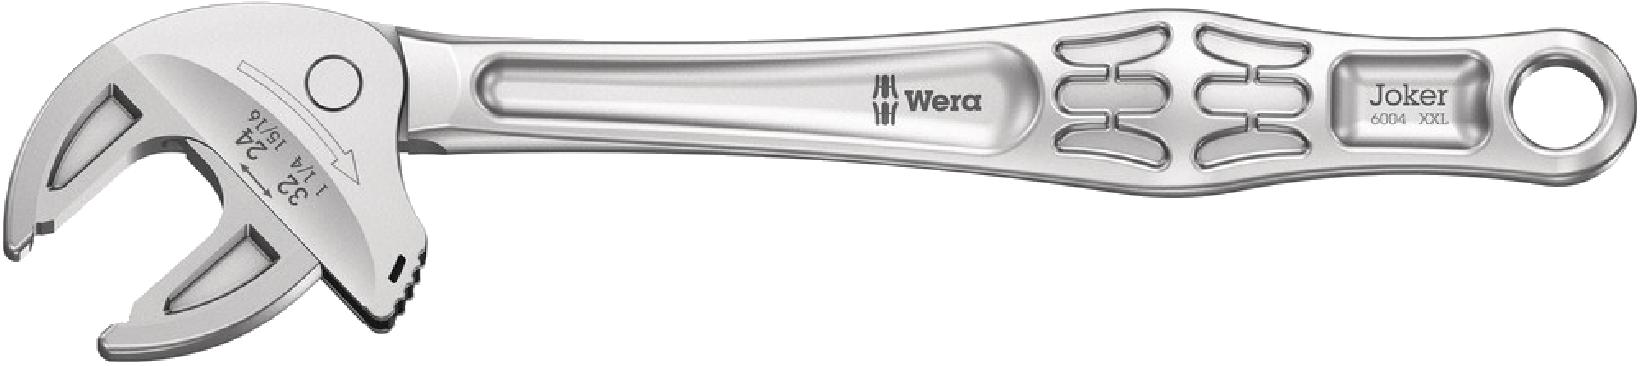 6004 Clé à fourche auto-ajustable Joker XXL  - 05020102001 - Wera Tools